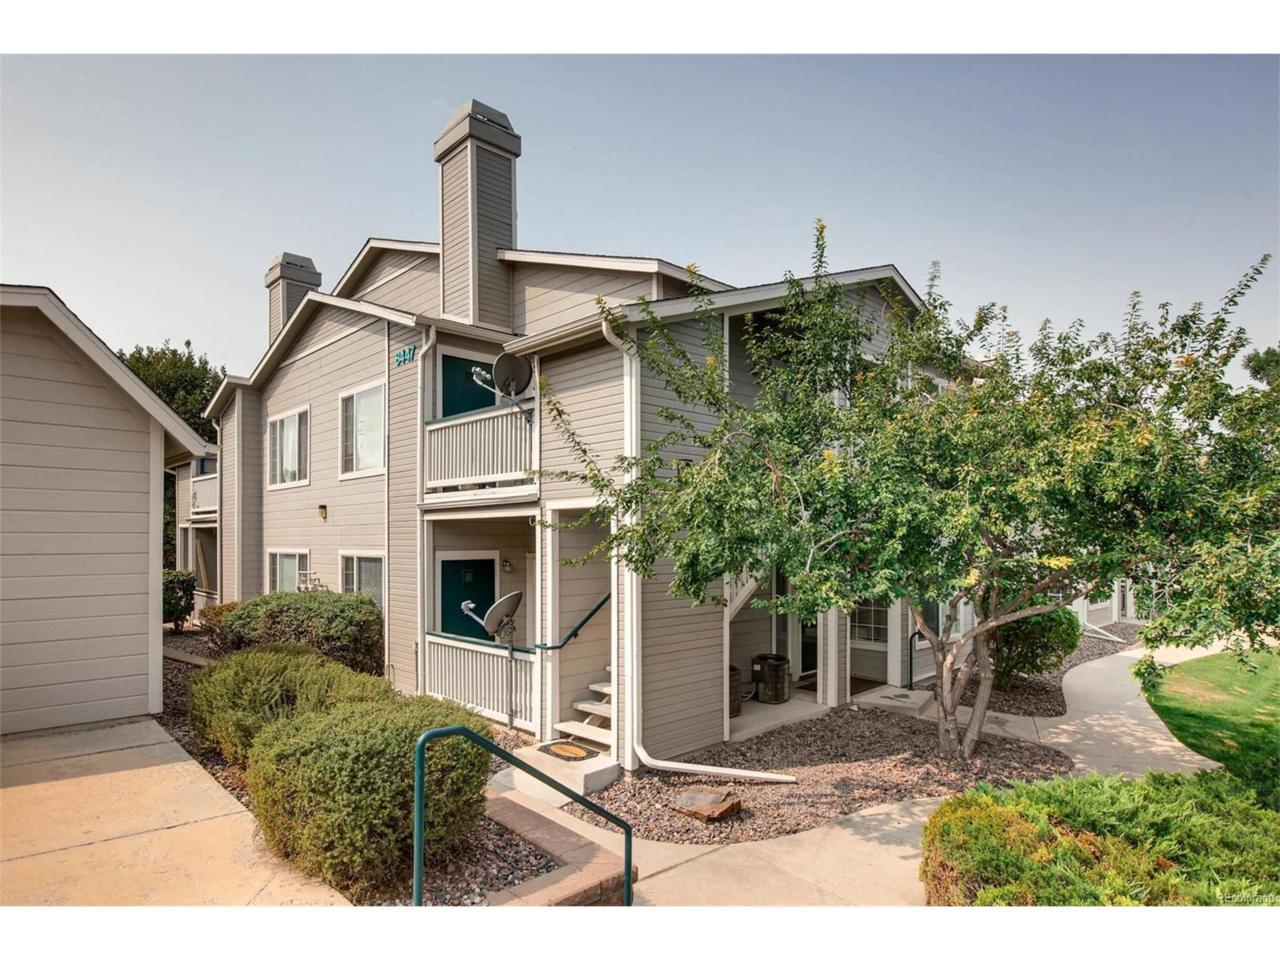 8447 Thunder Ridge Way #104, Highlands Ranch, CO 80126 (MLS #3736359) :: 8z Real Estate